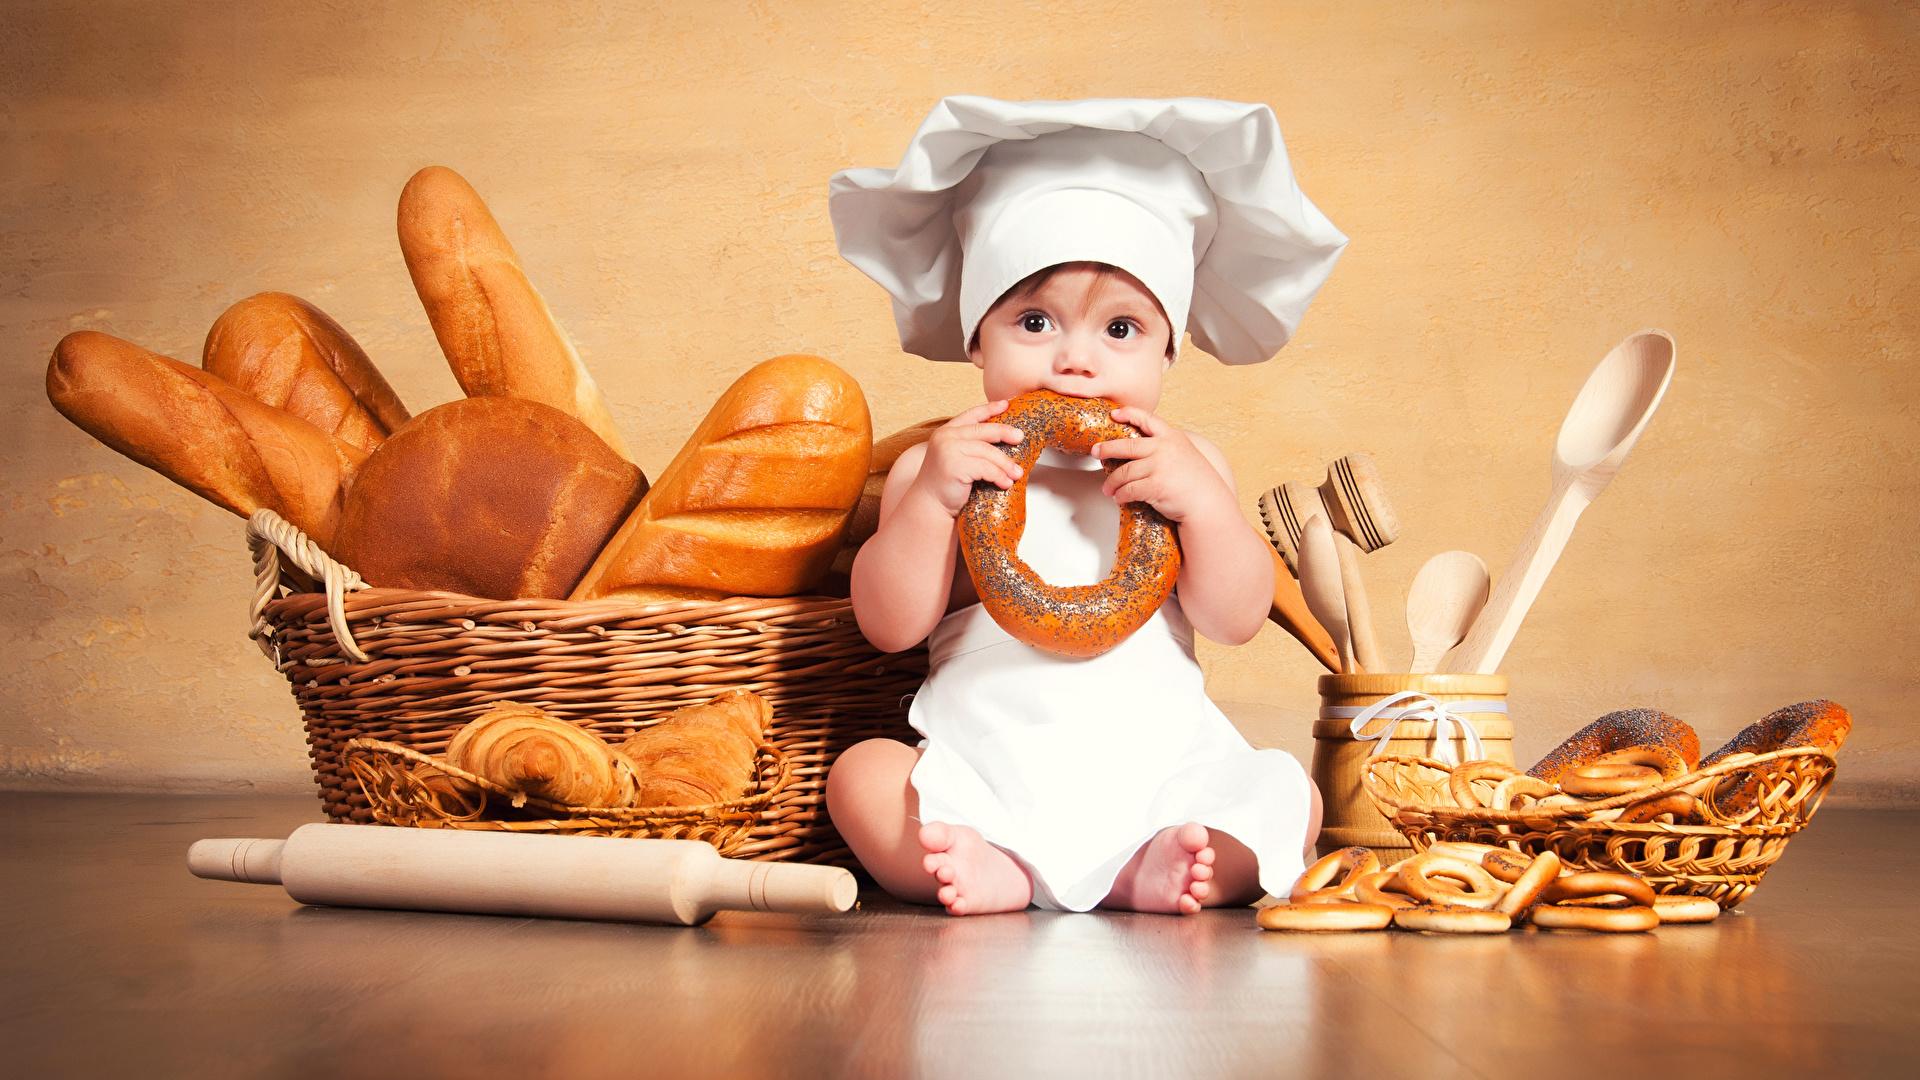 Фото Младенцы ребёнок шляпе Хлеб Корзинка повары сидящие Выпечка 1920x1080 младенца младенец грудной ребёнок Дети Шляпа шляпы корзины Корзина сидя Сидит Повар повара